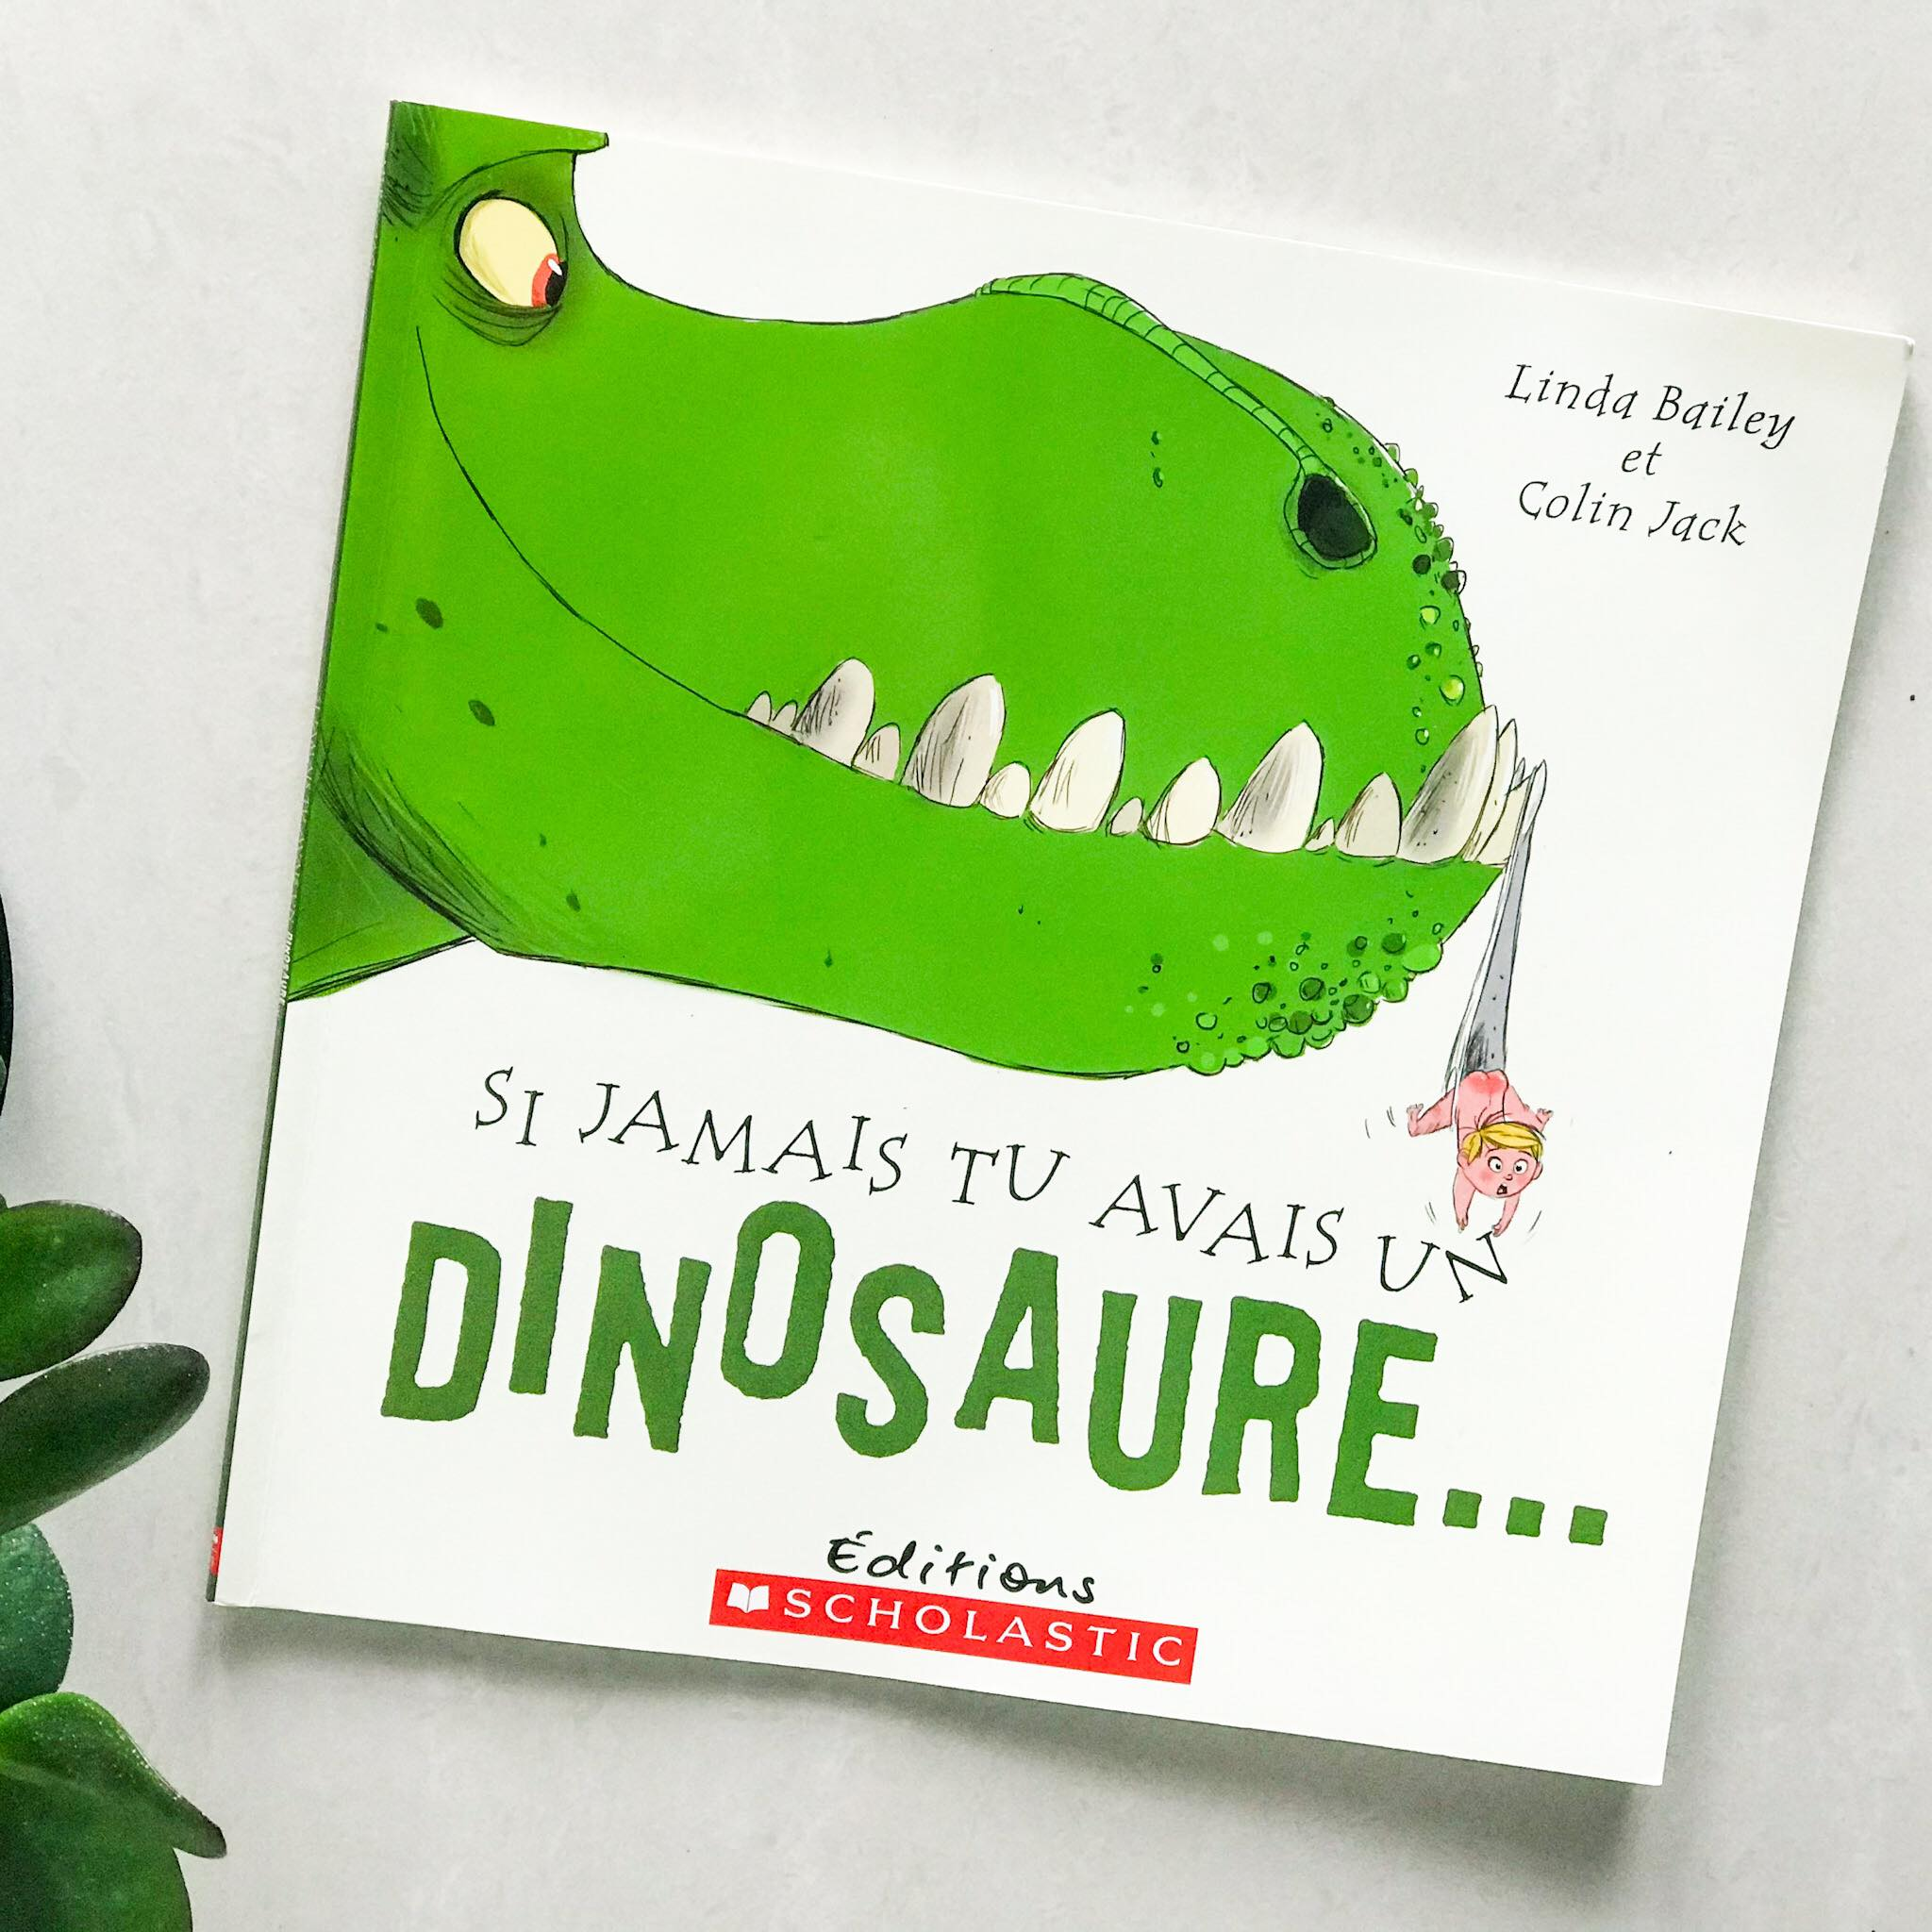 Si jamais tu avais un dinosaure